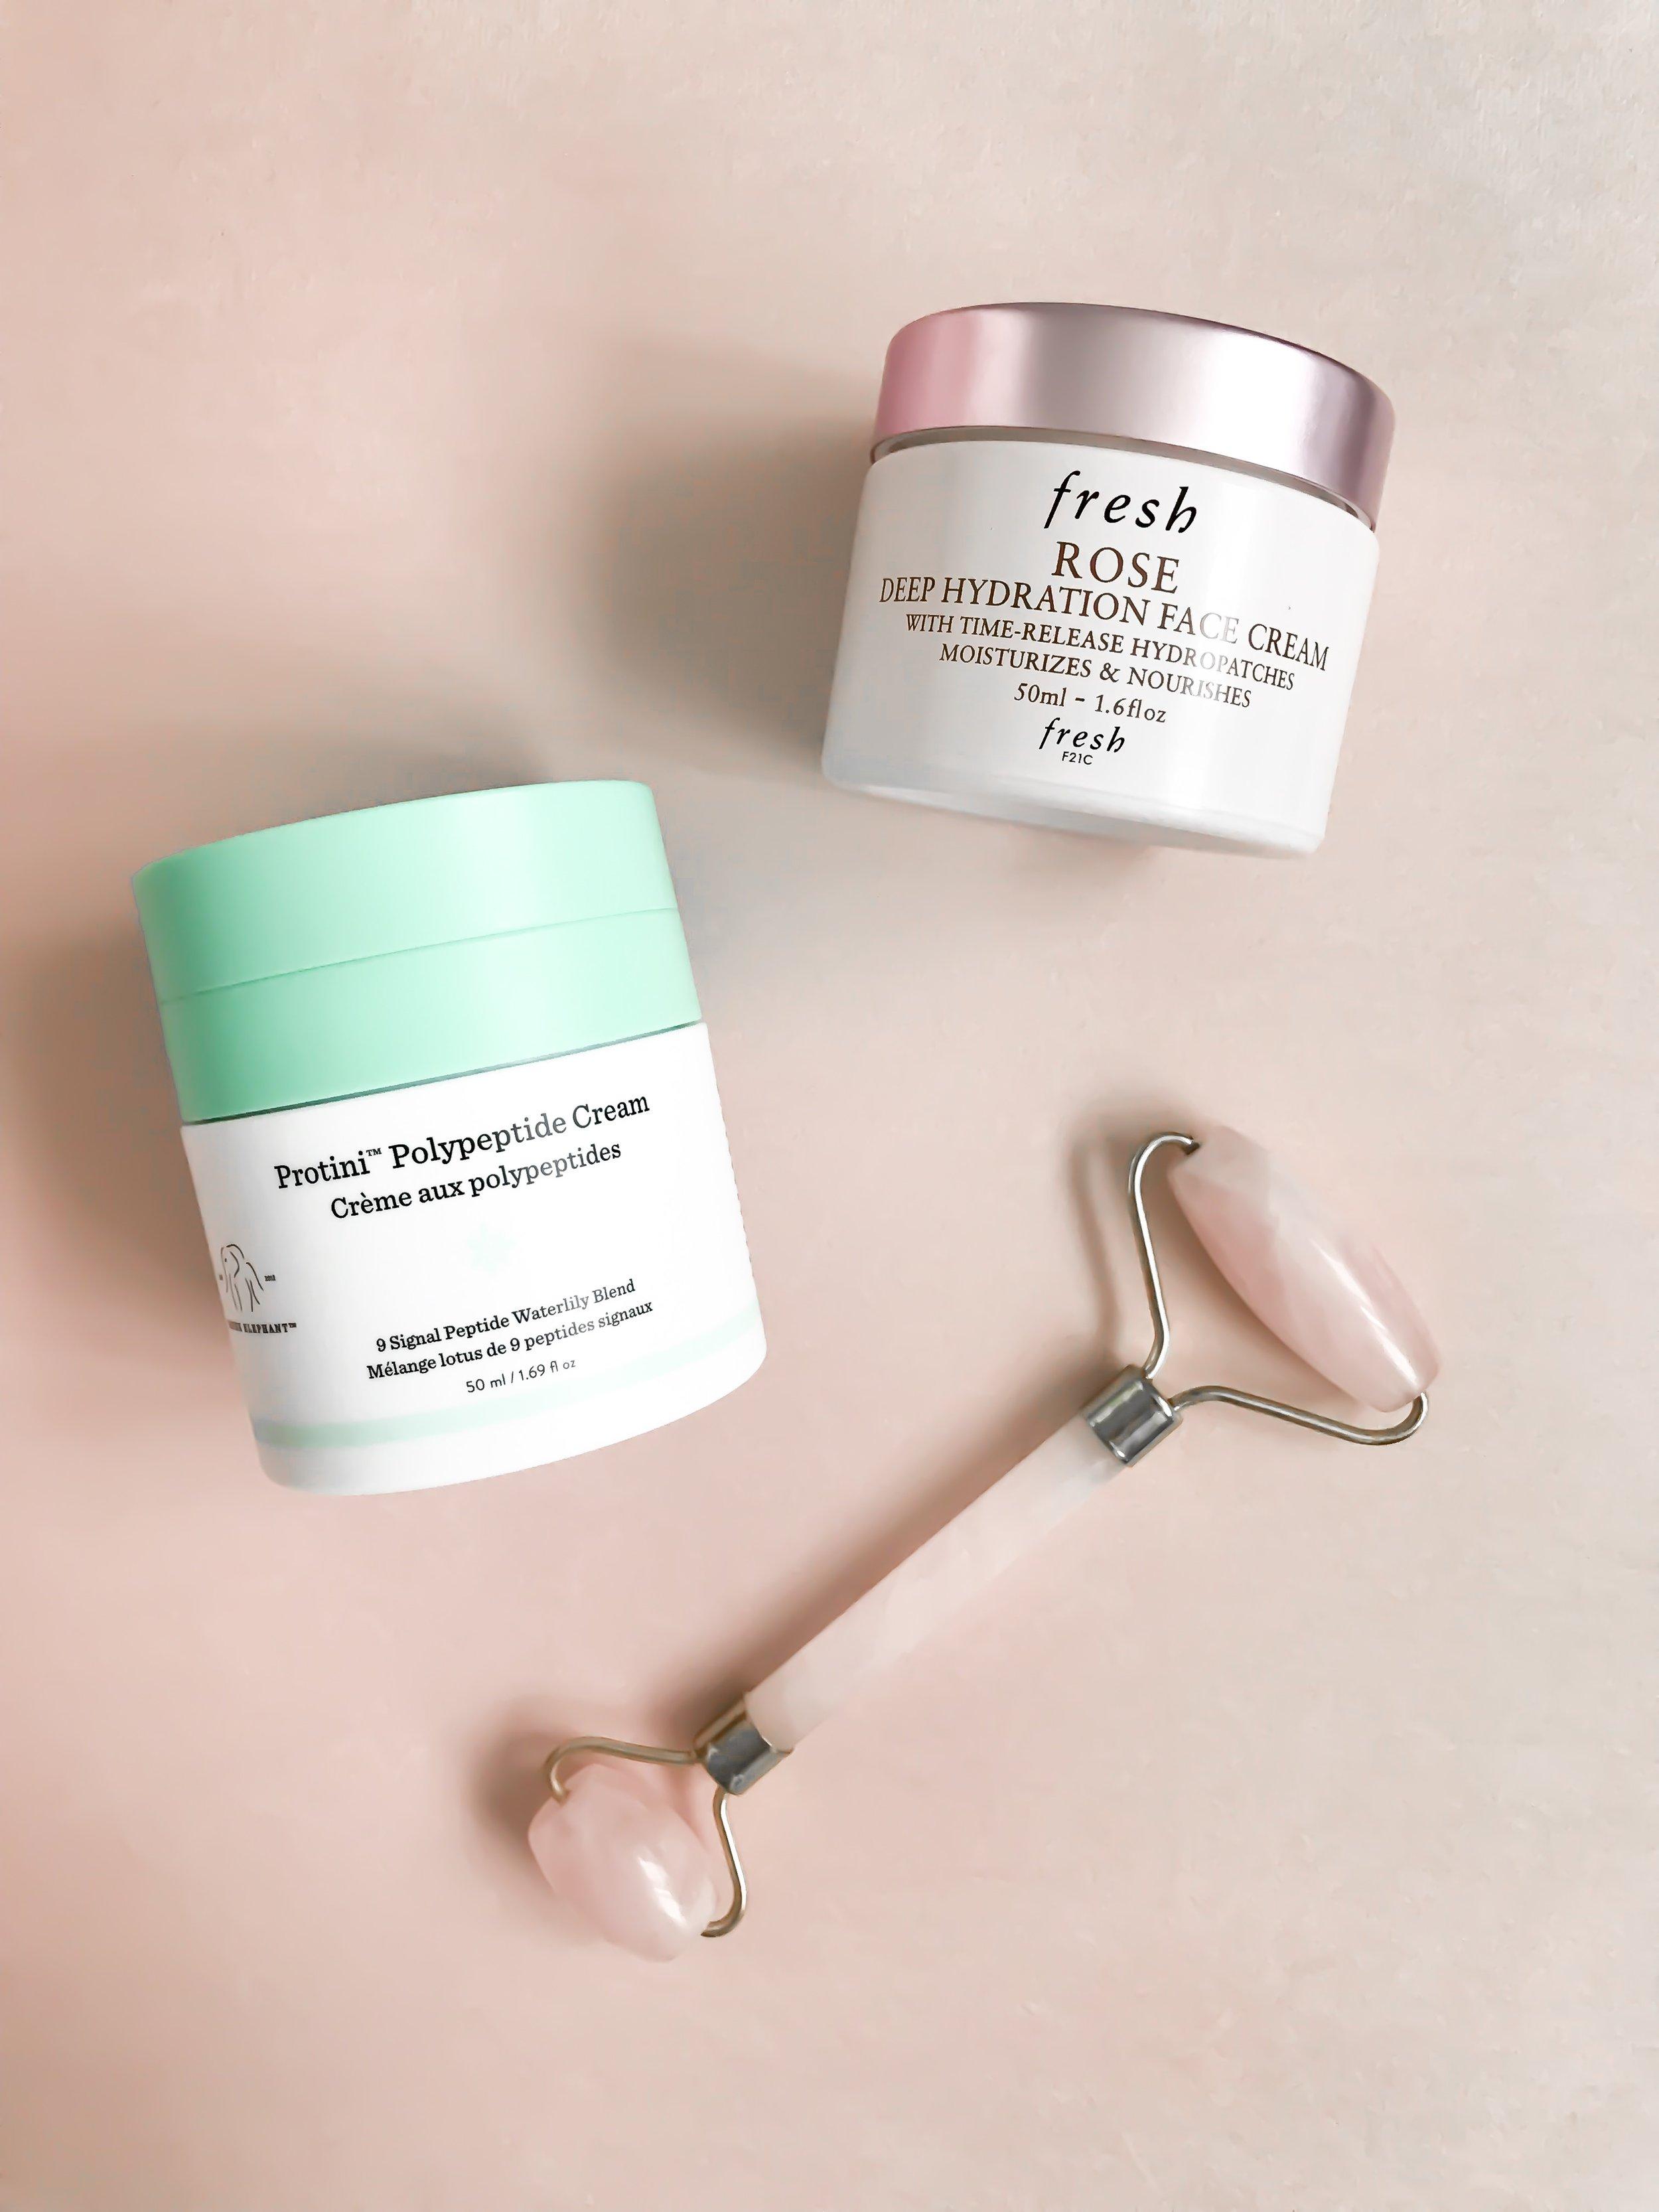 Spring Skincare Routine | Pine Barren Beauty | spring skincare, drunk elephant protini face cream, fresh rose moisturizer, rose quartz facial roller